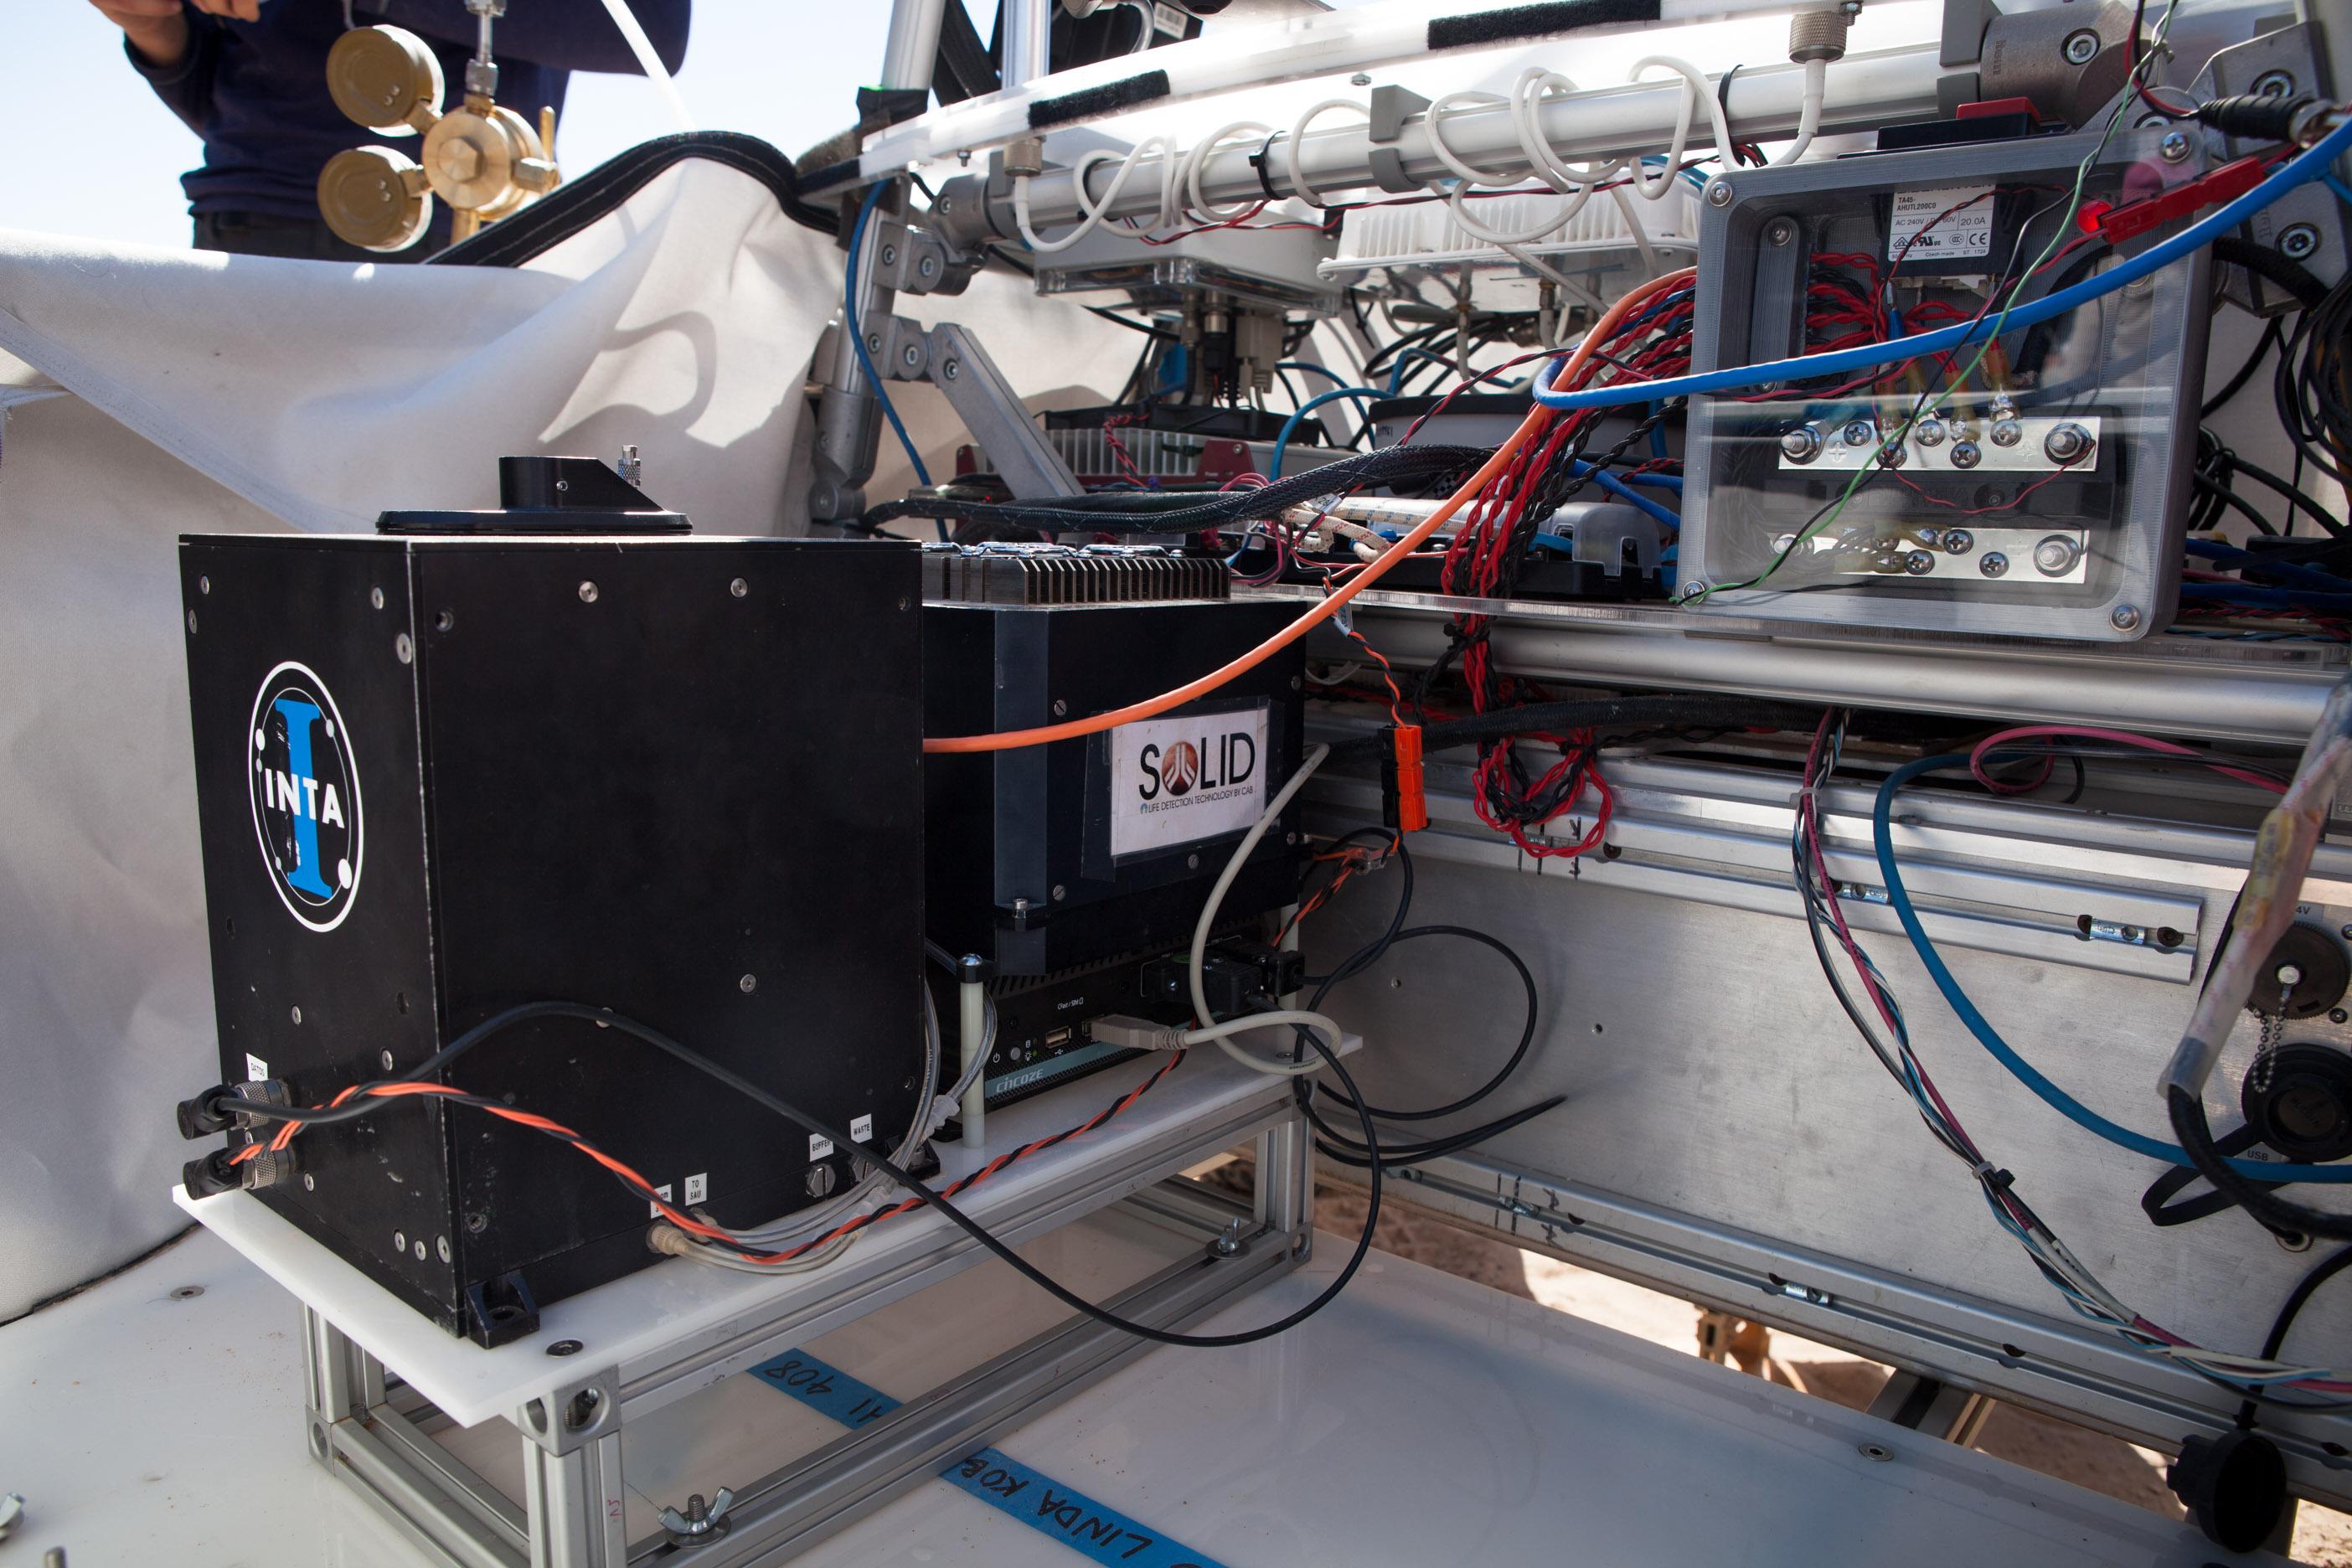 SOLID on krex2 Rover Platform